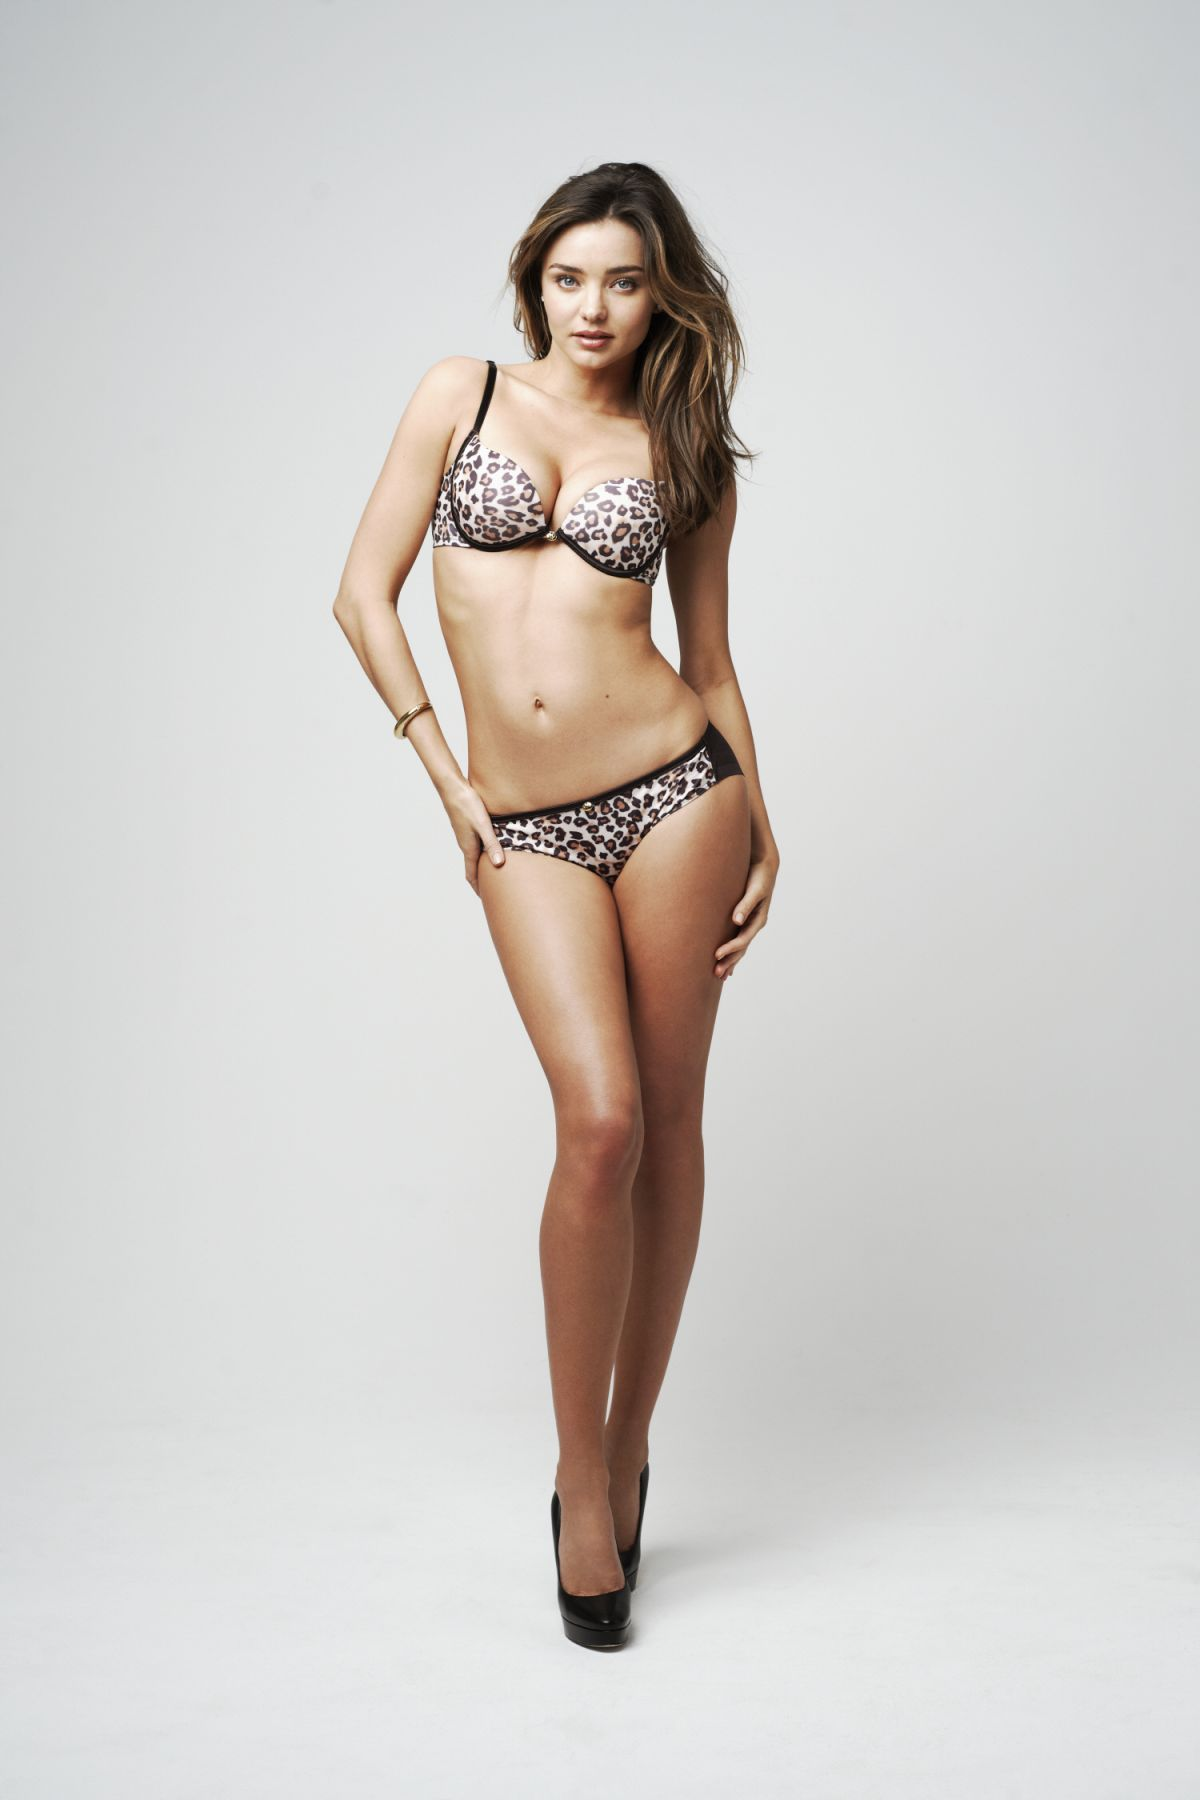 miranda-kerr-topless